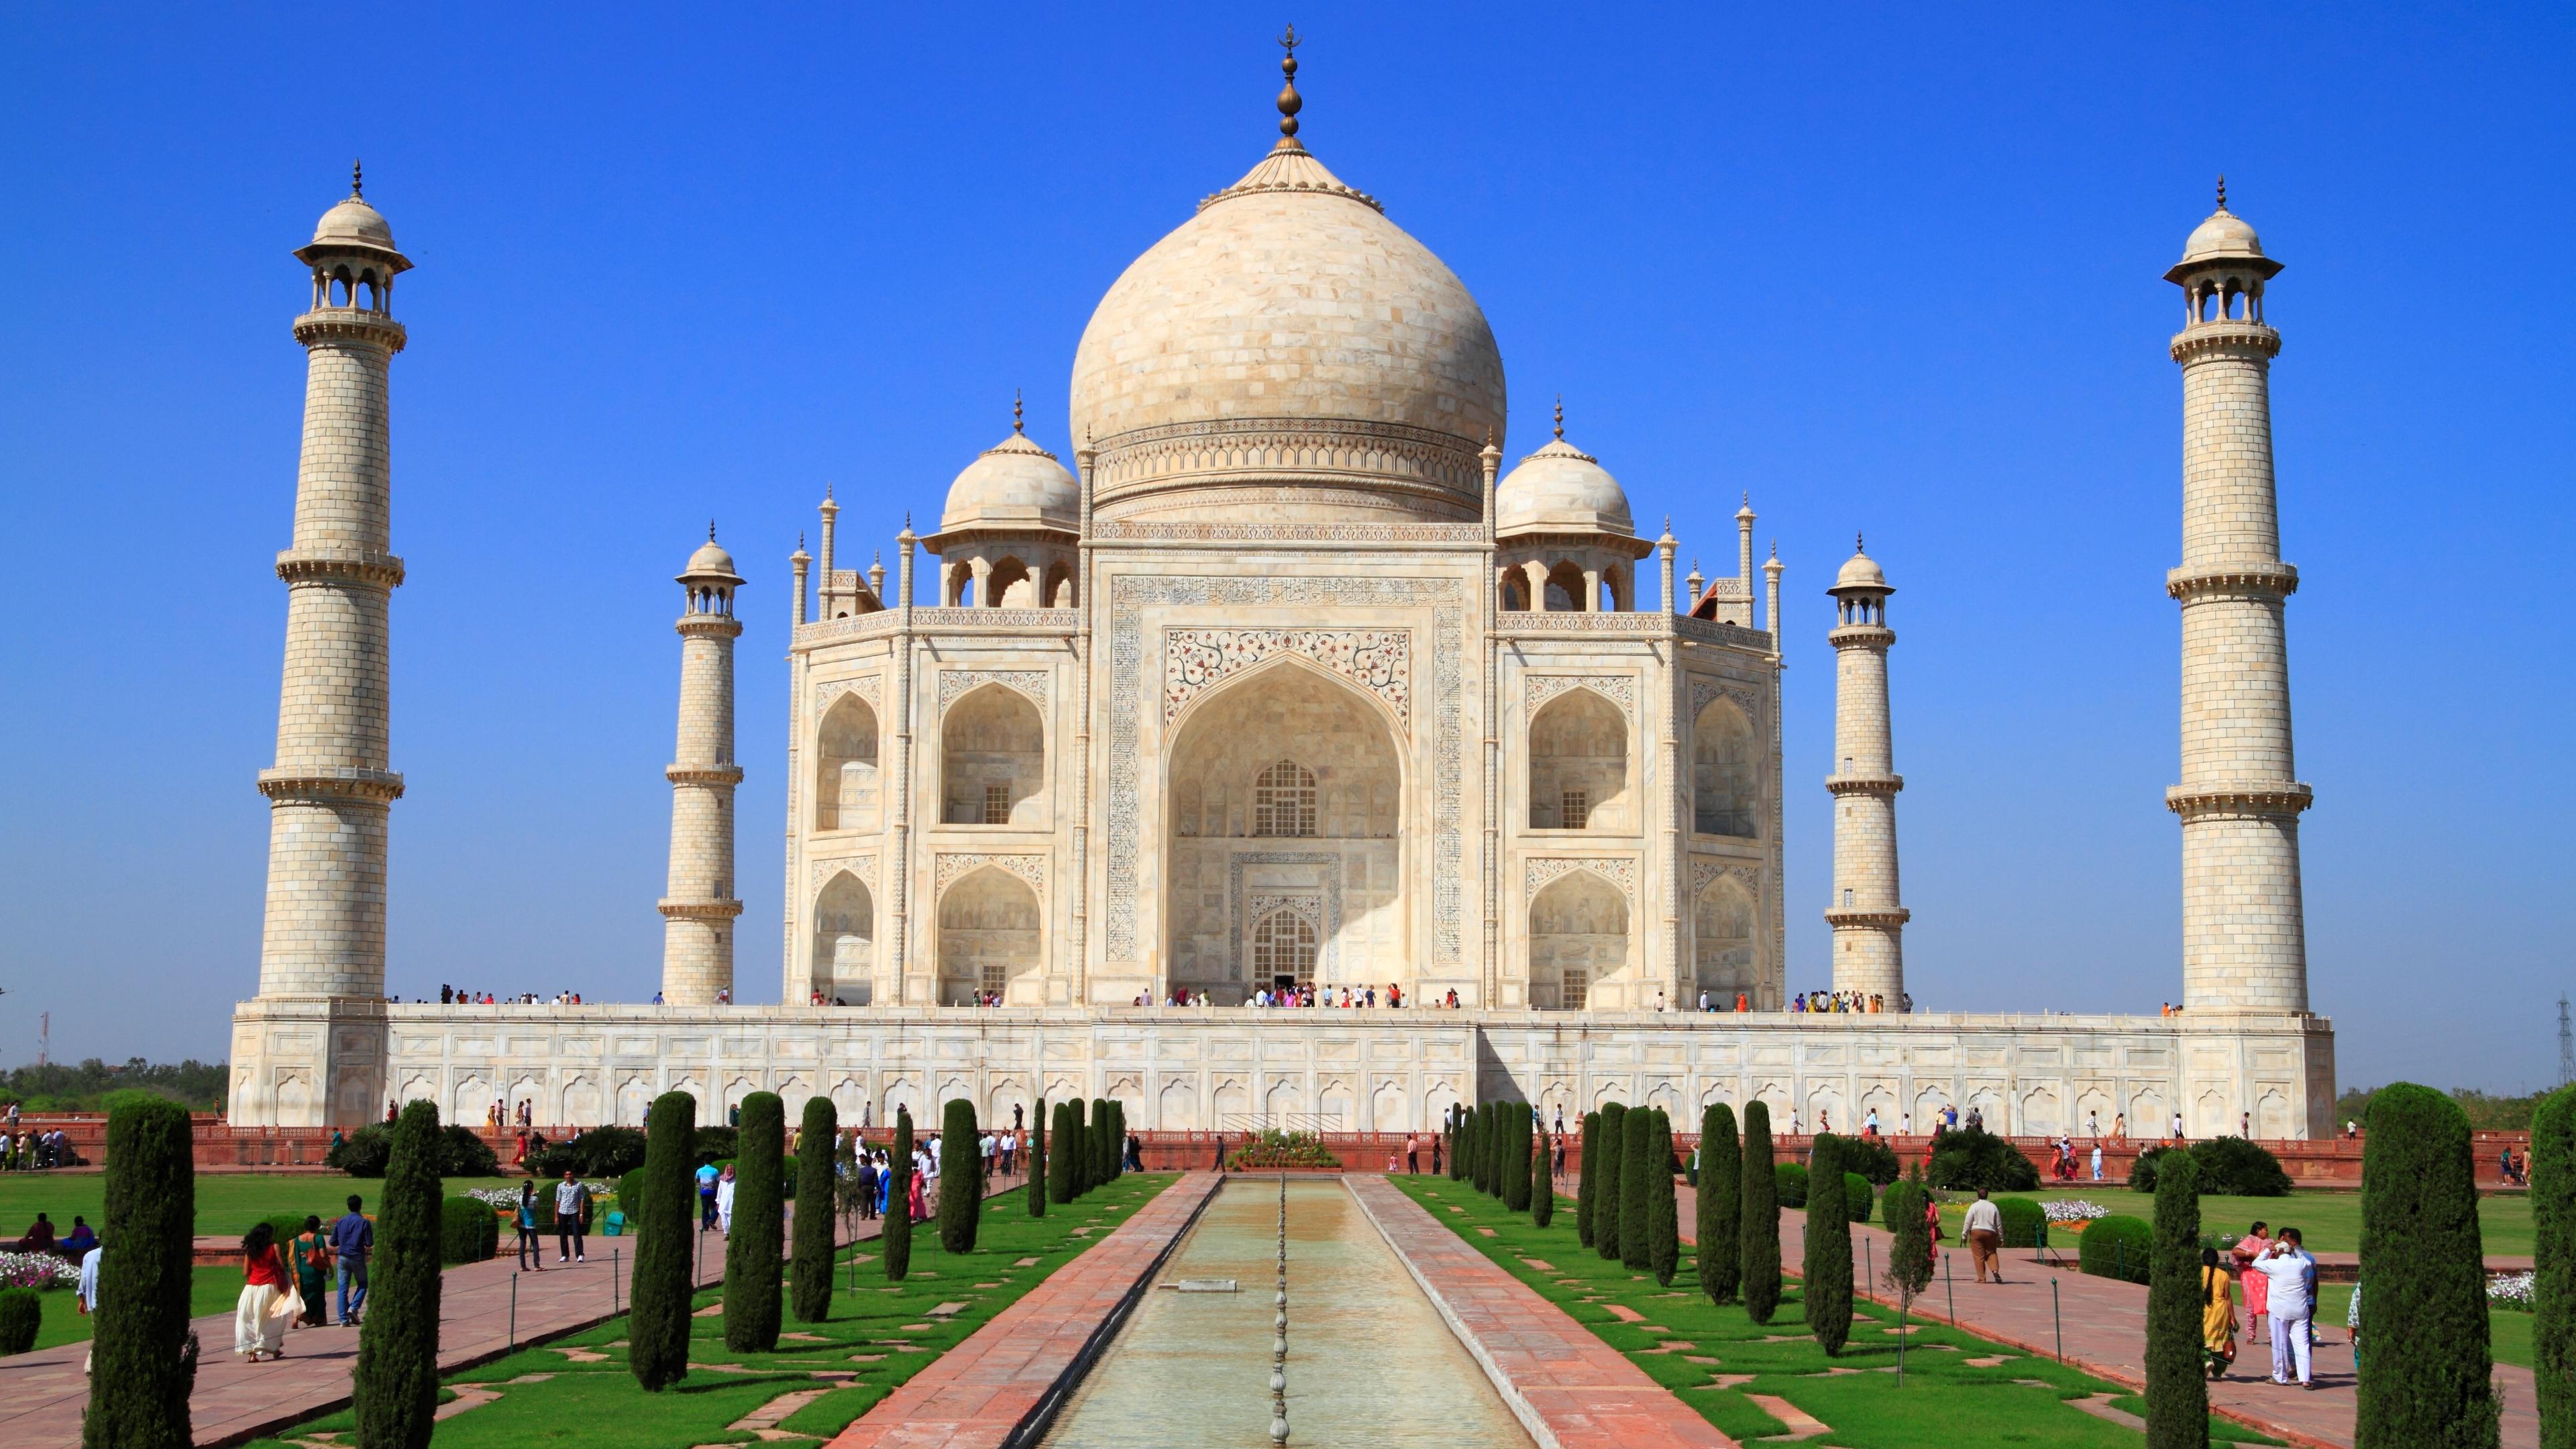 HQ Taj Mahal Wallpapers | File 5135.39Kb